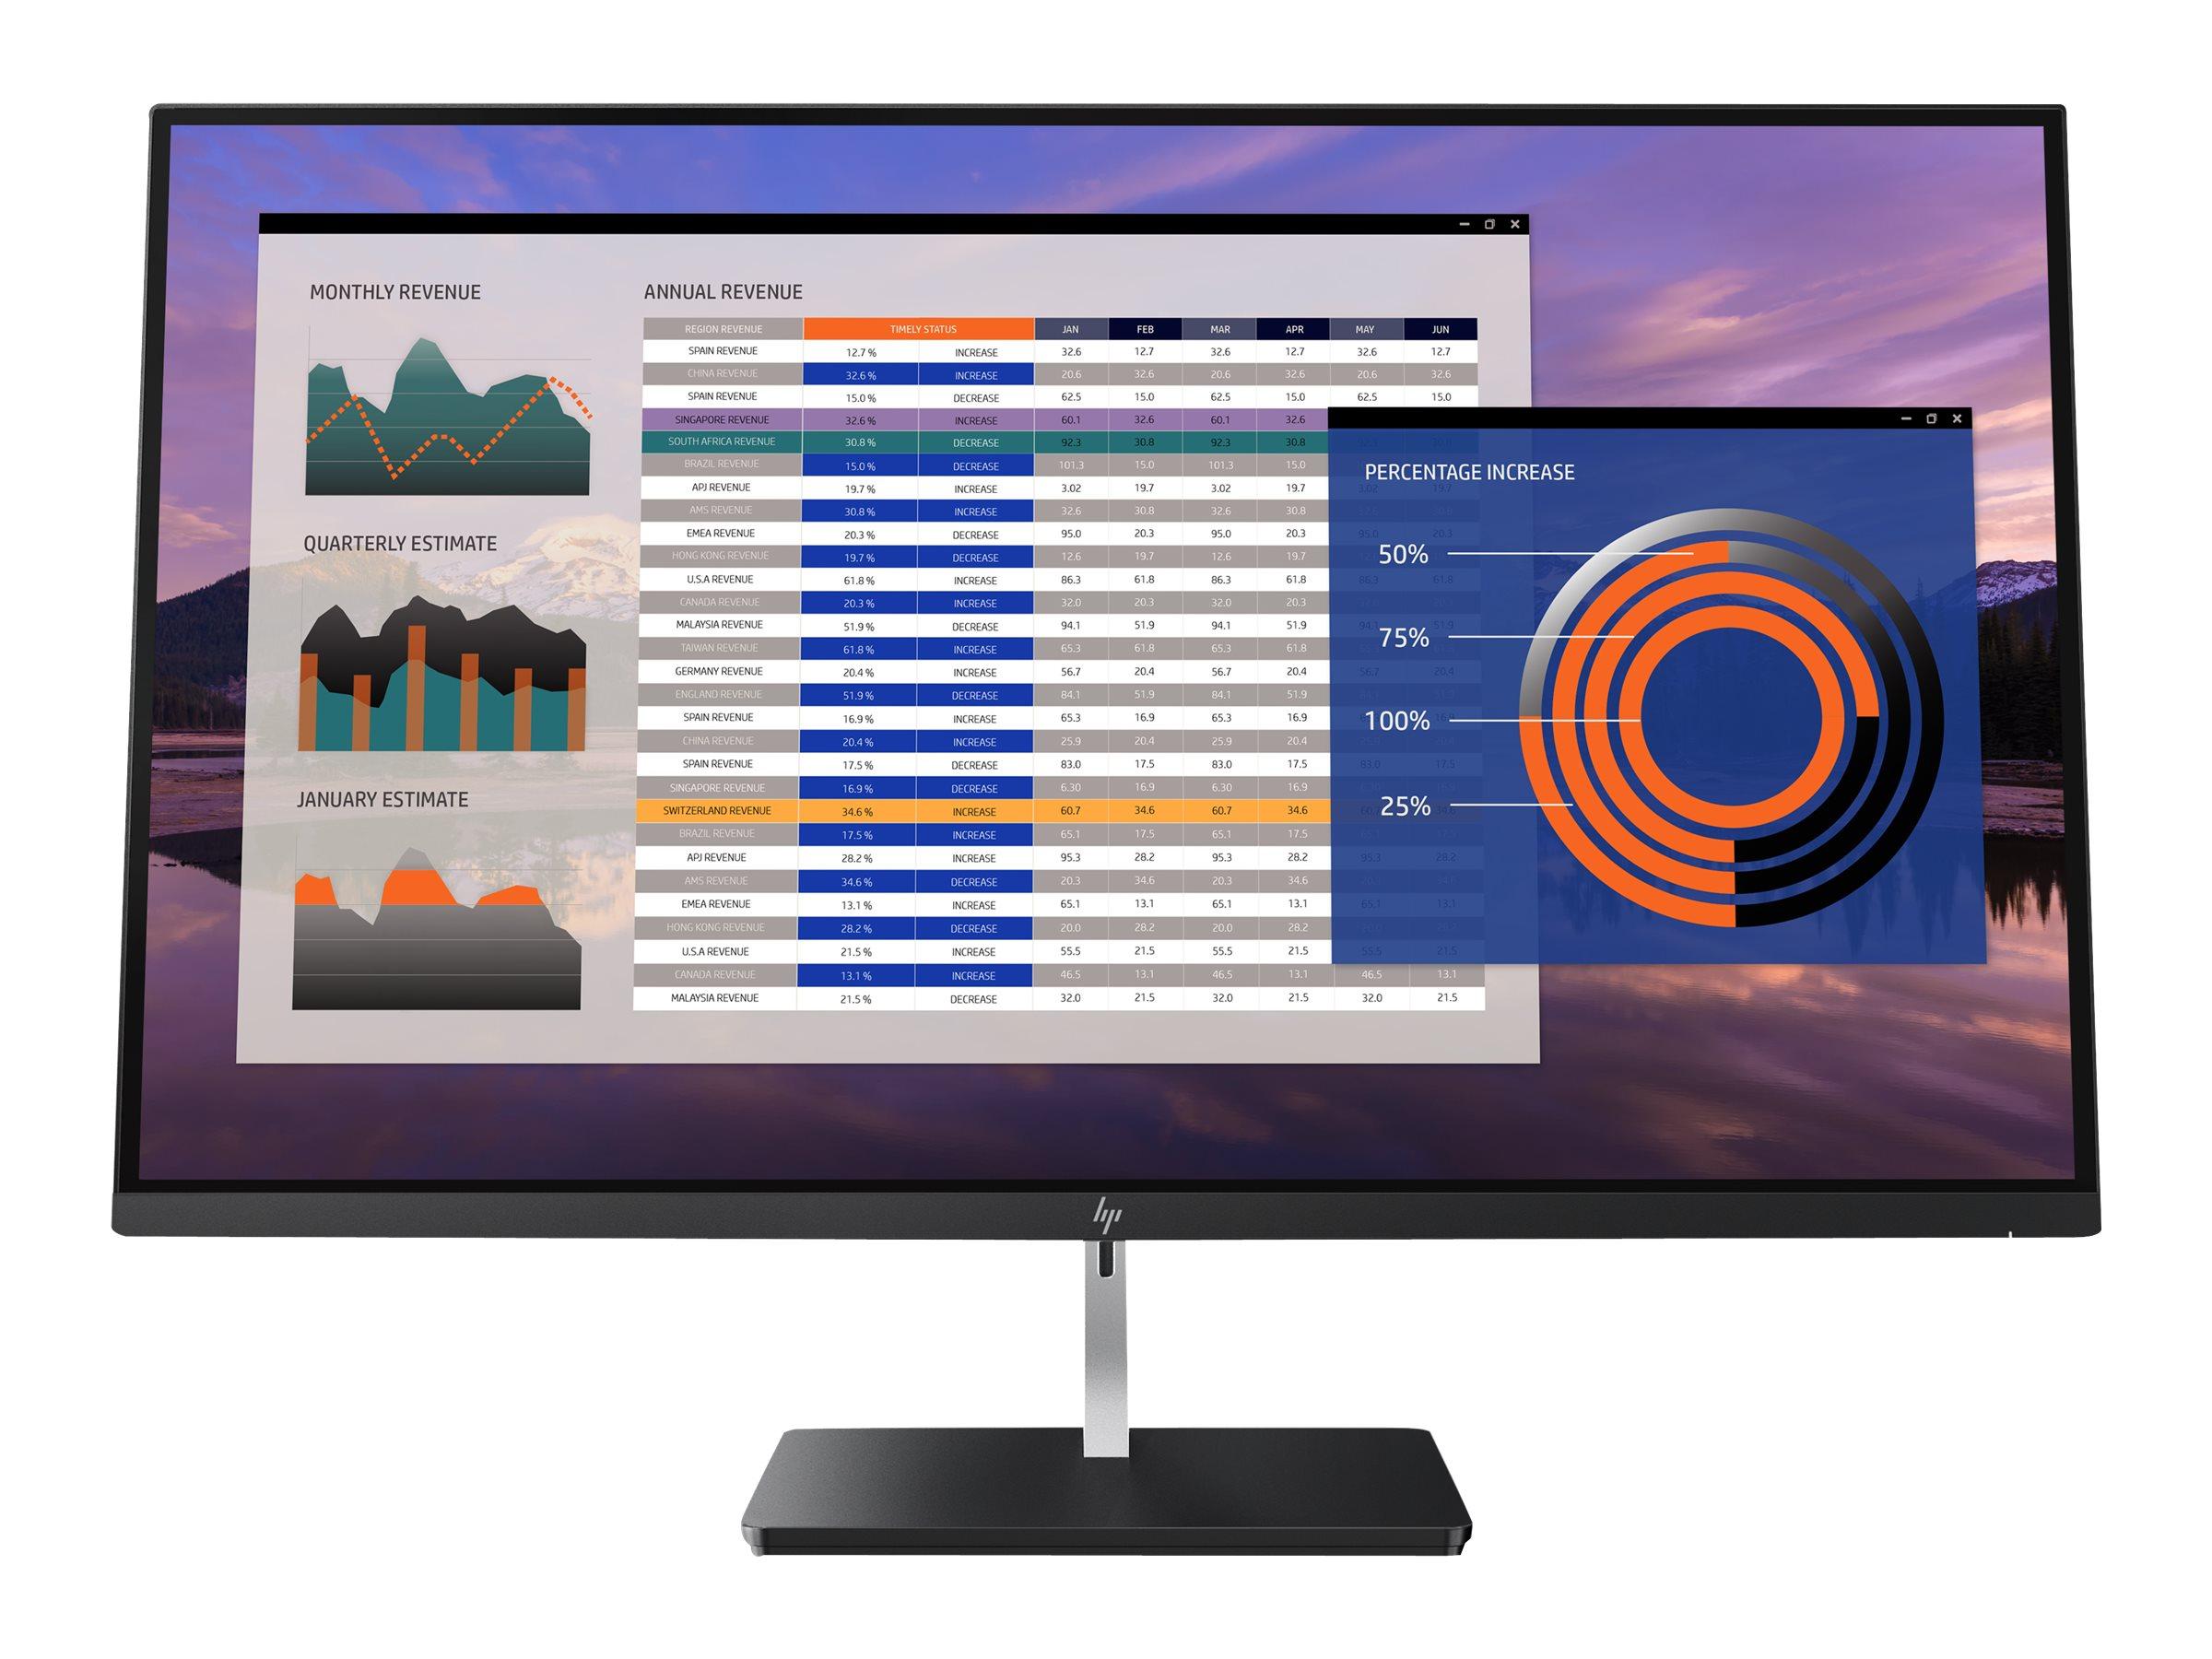 Hp elitedisplay s270n led monitor 68 6 cm 27 3840 x 2160 4k ips 350 cd m 8492123 2pd37aa abb